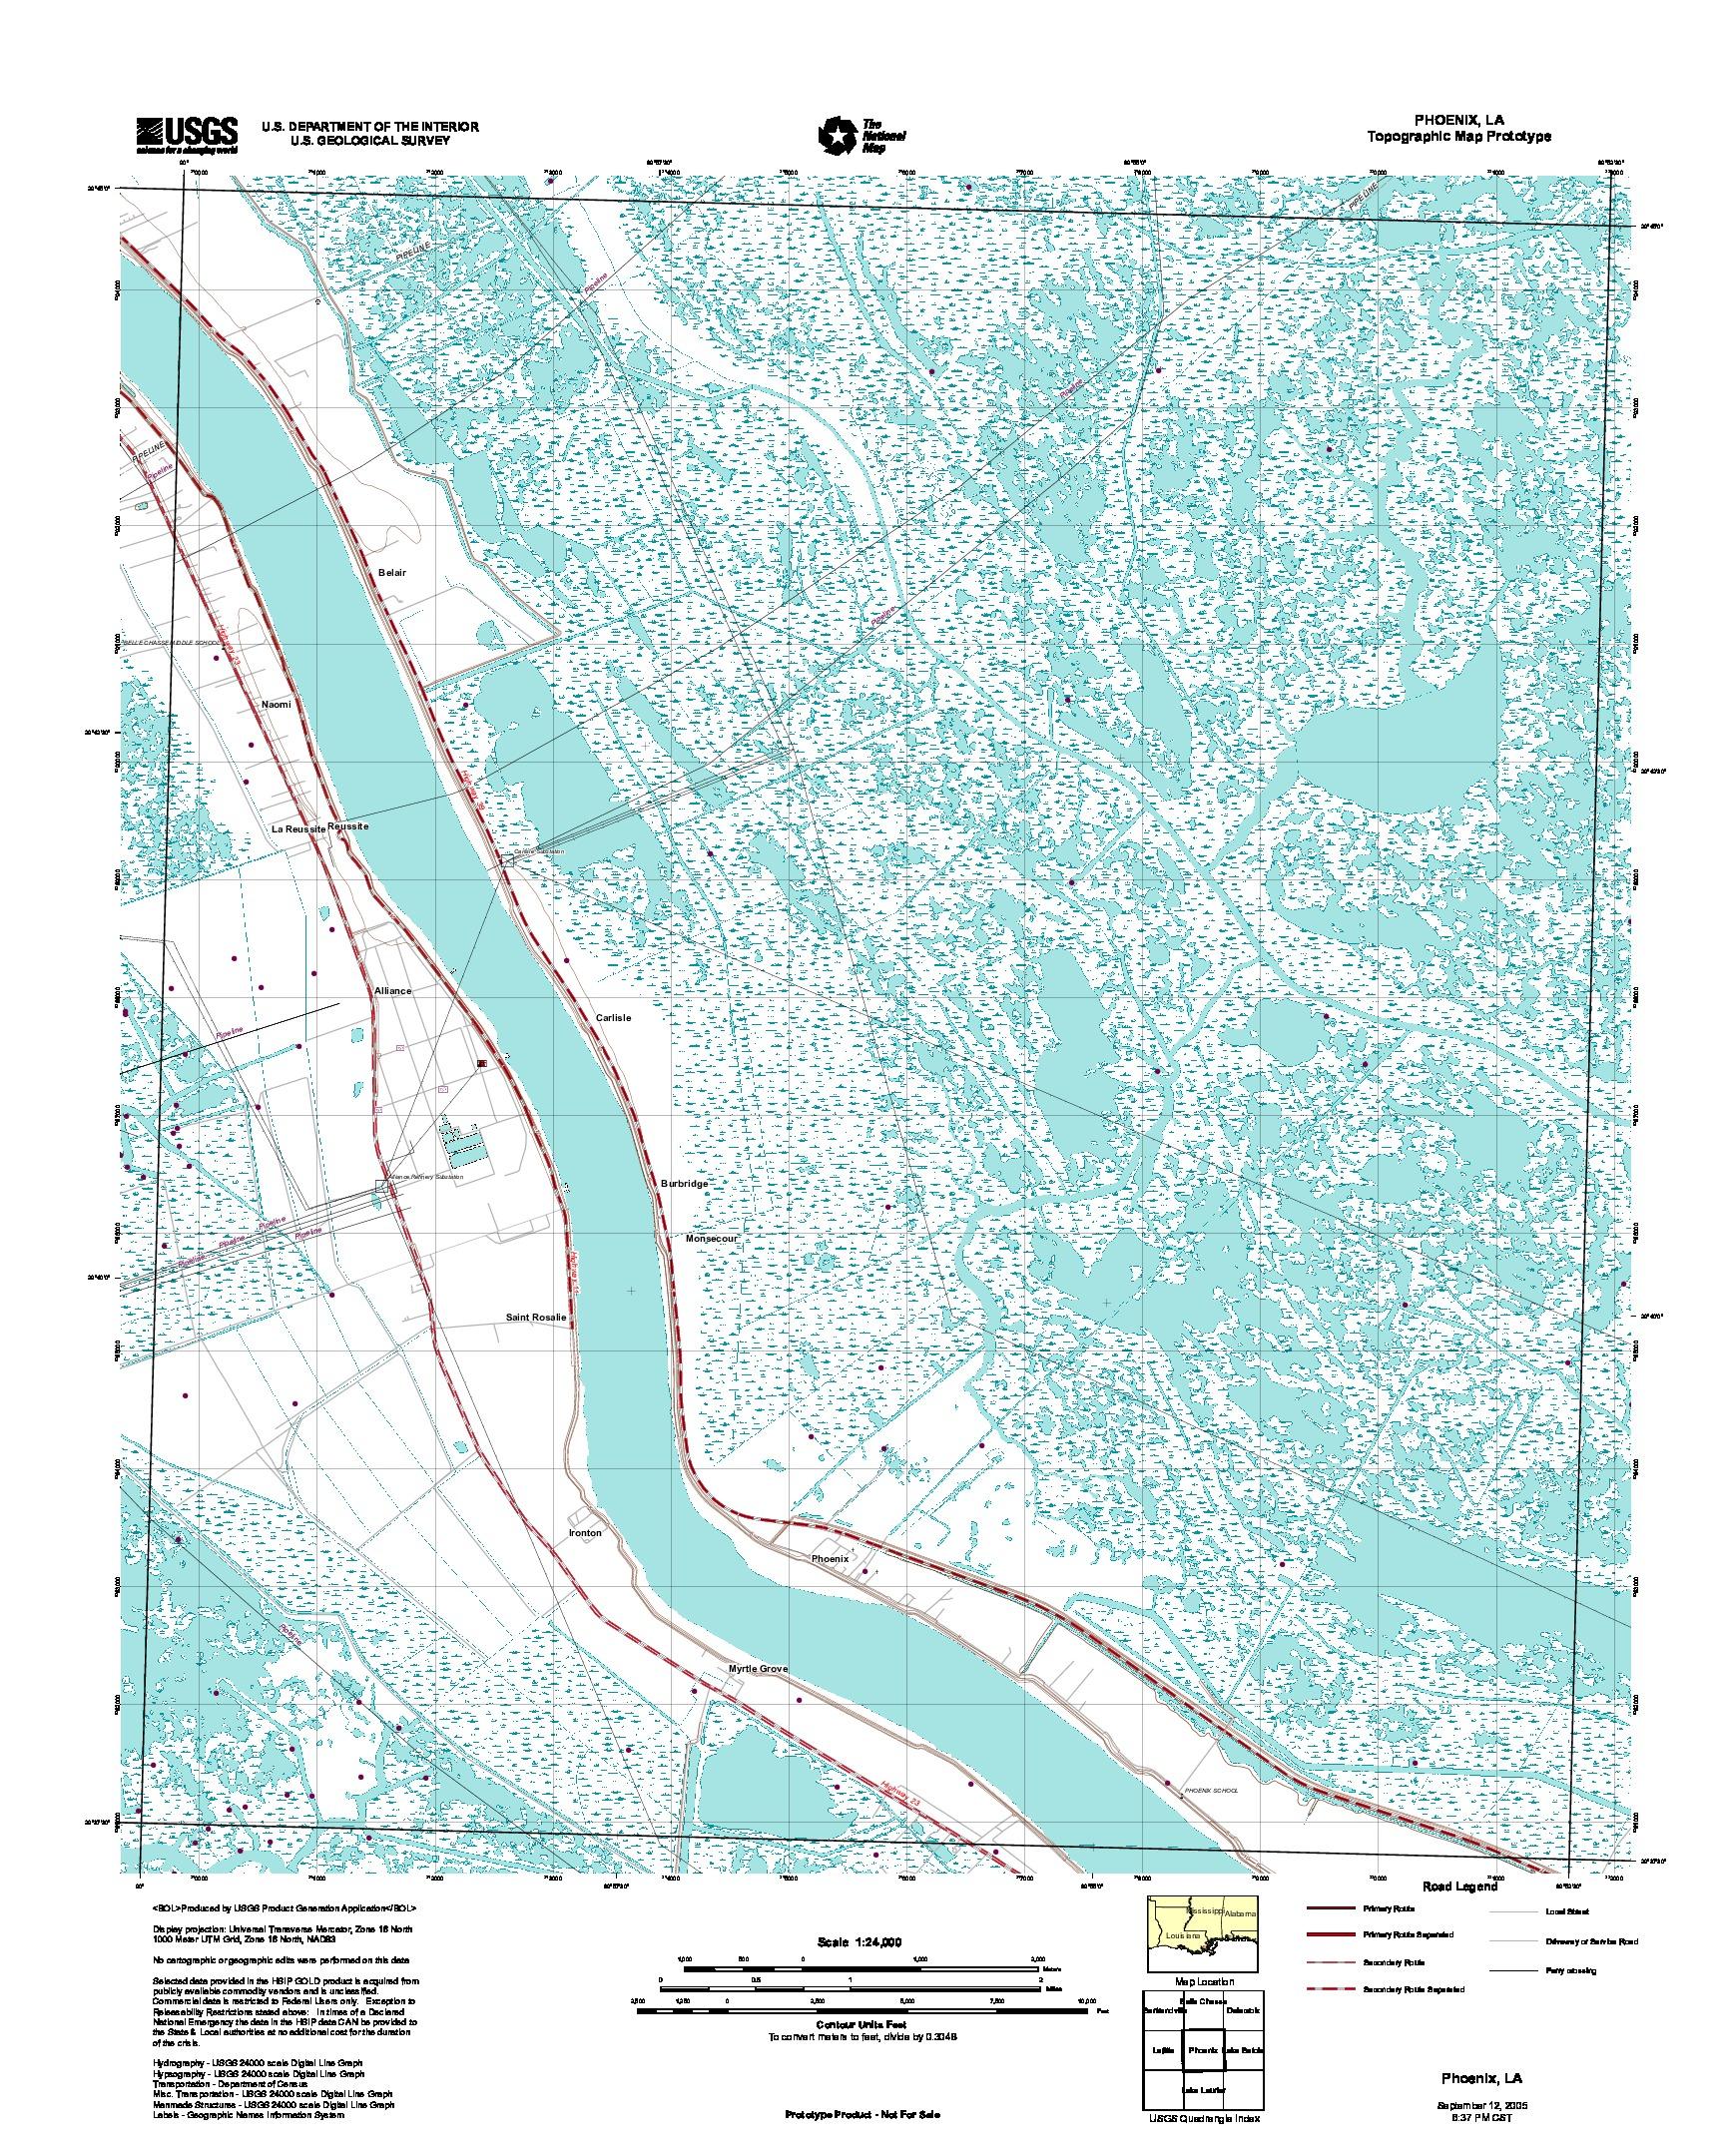 Phoenix, Topographic Map Prototype, Louisiana, United States, September 12, 2005